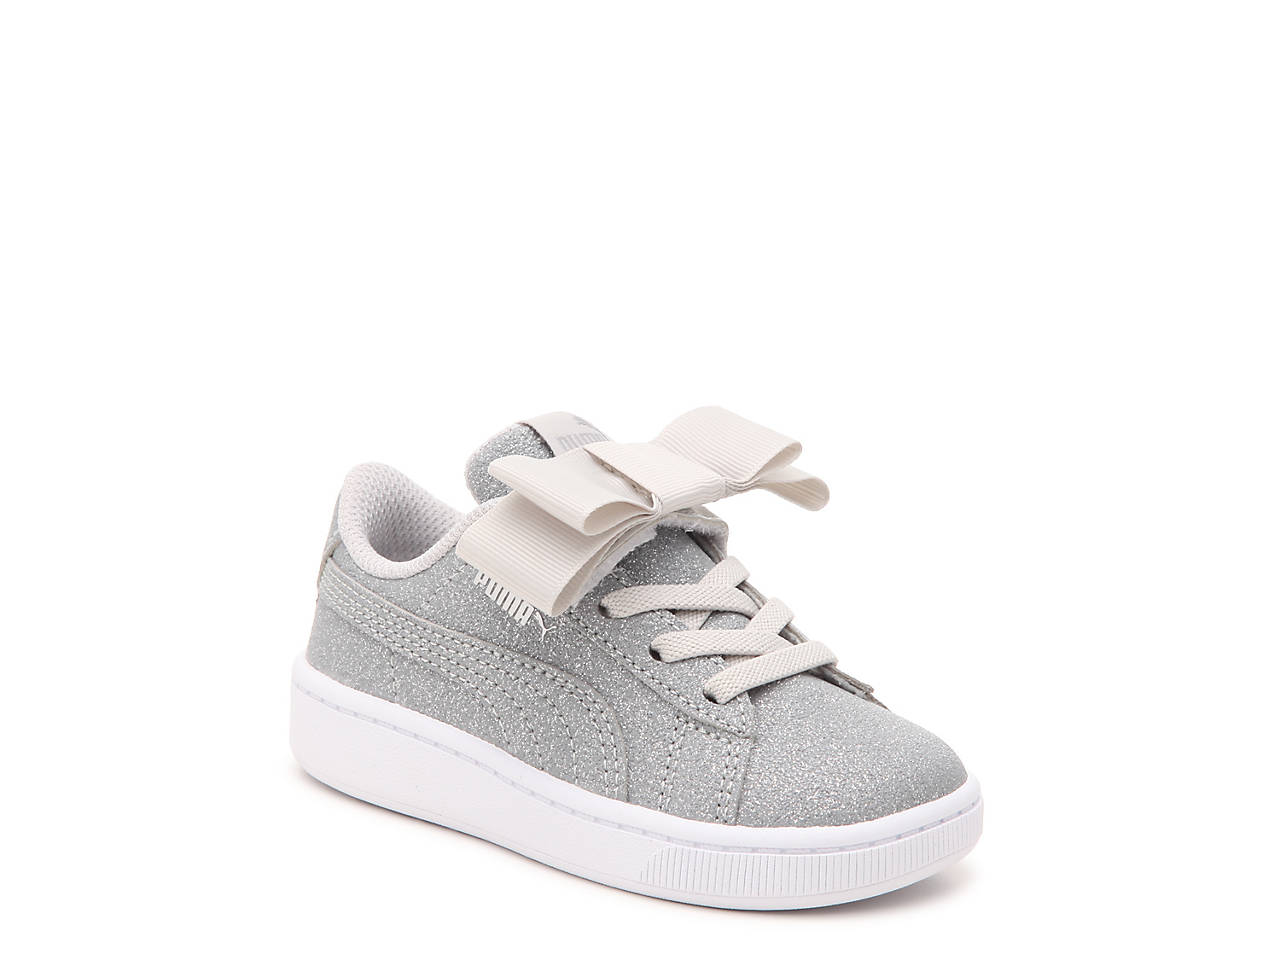 4a46f362a8 Vikky V2 Ribbon Sneaker - Kids'